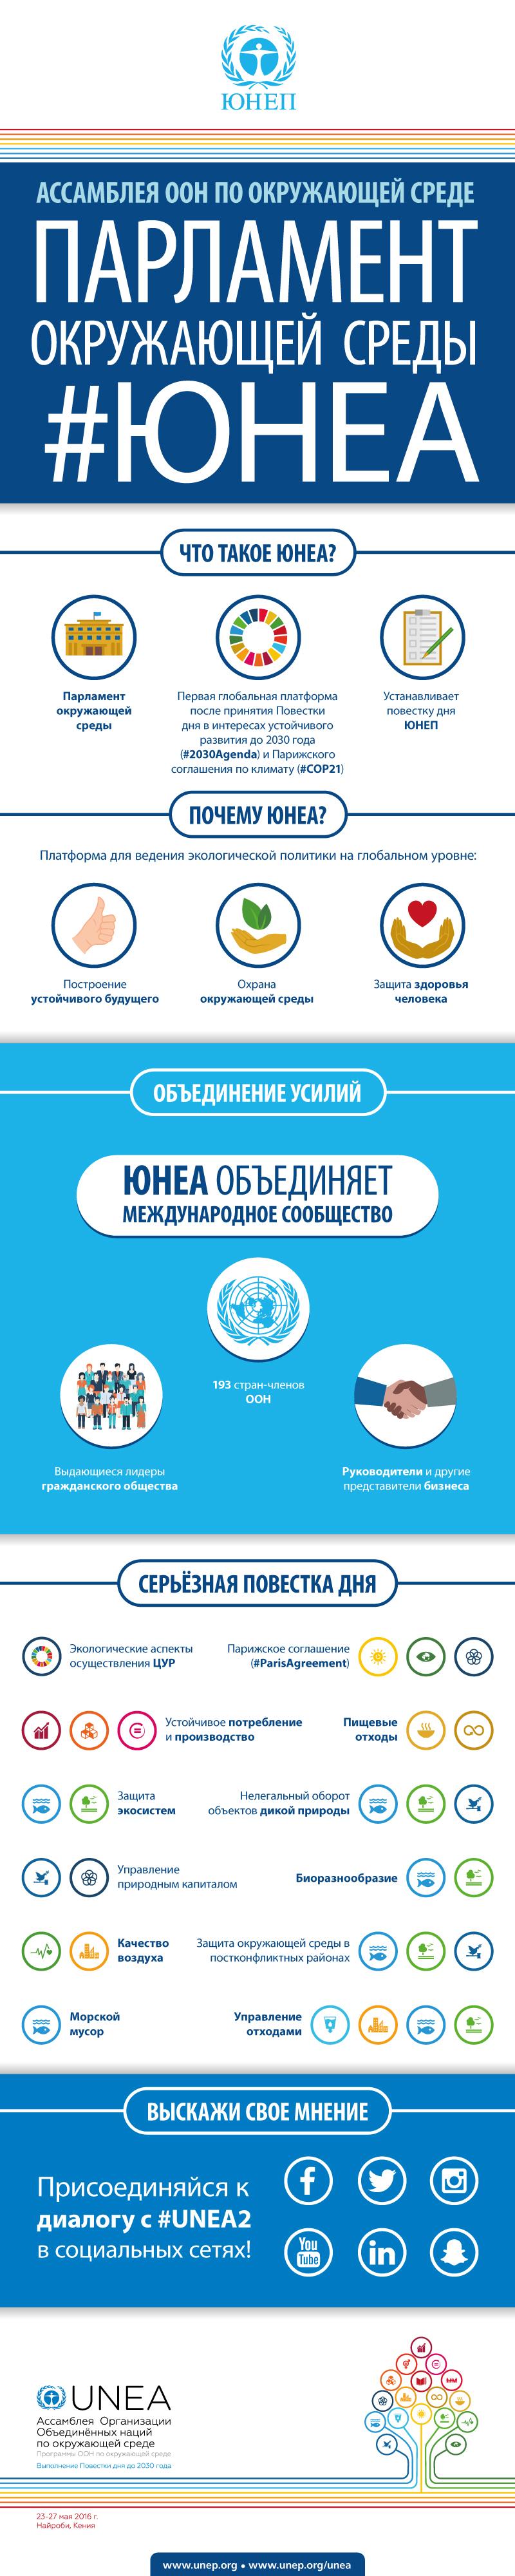 UNEA_Infog_ru.jpg